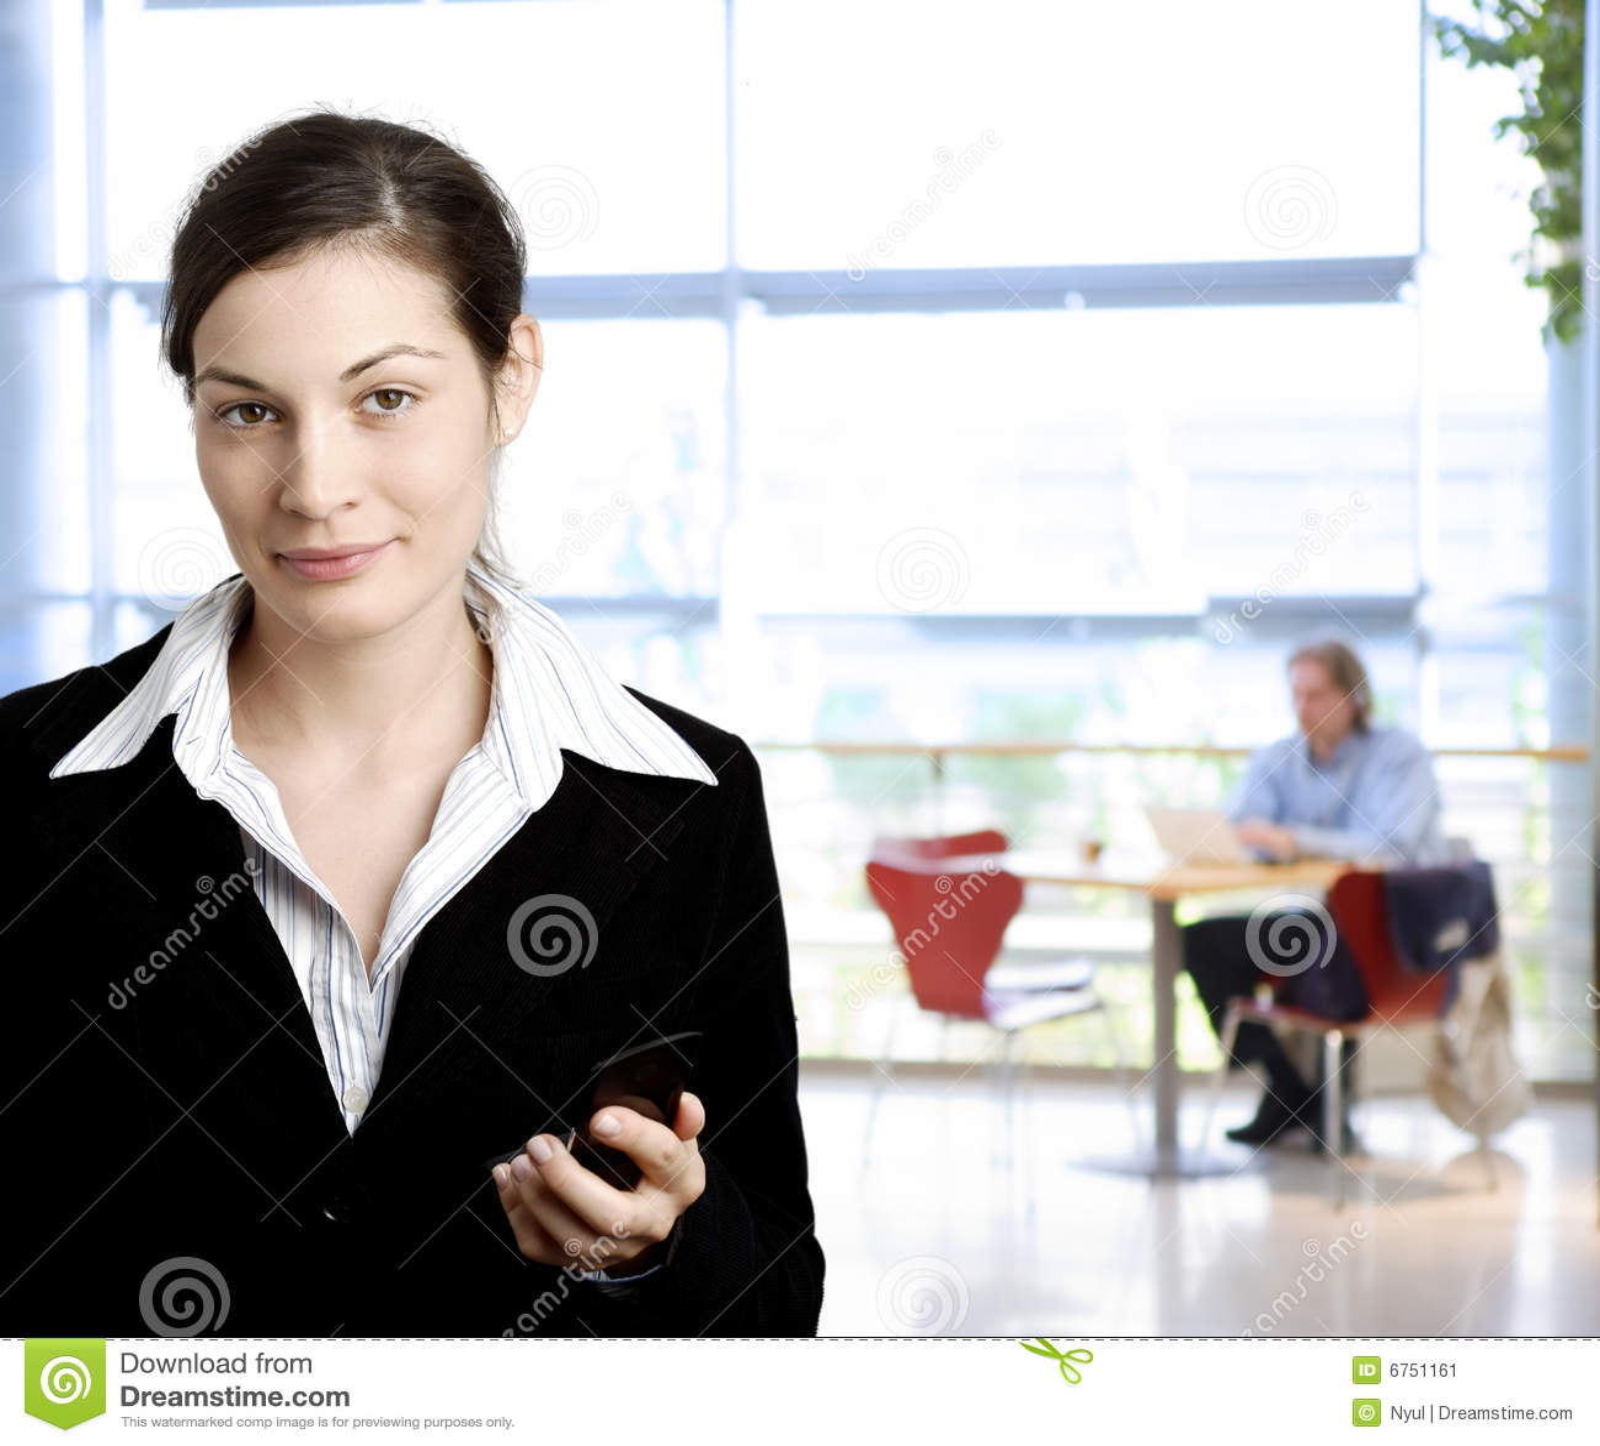 Businesswoman mobile phone